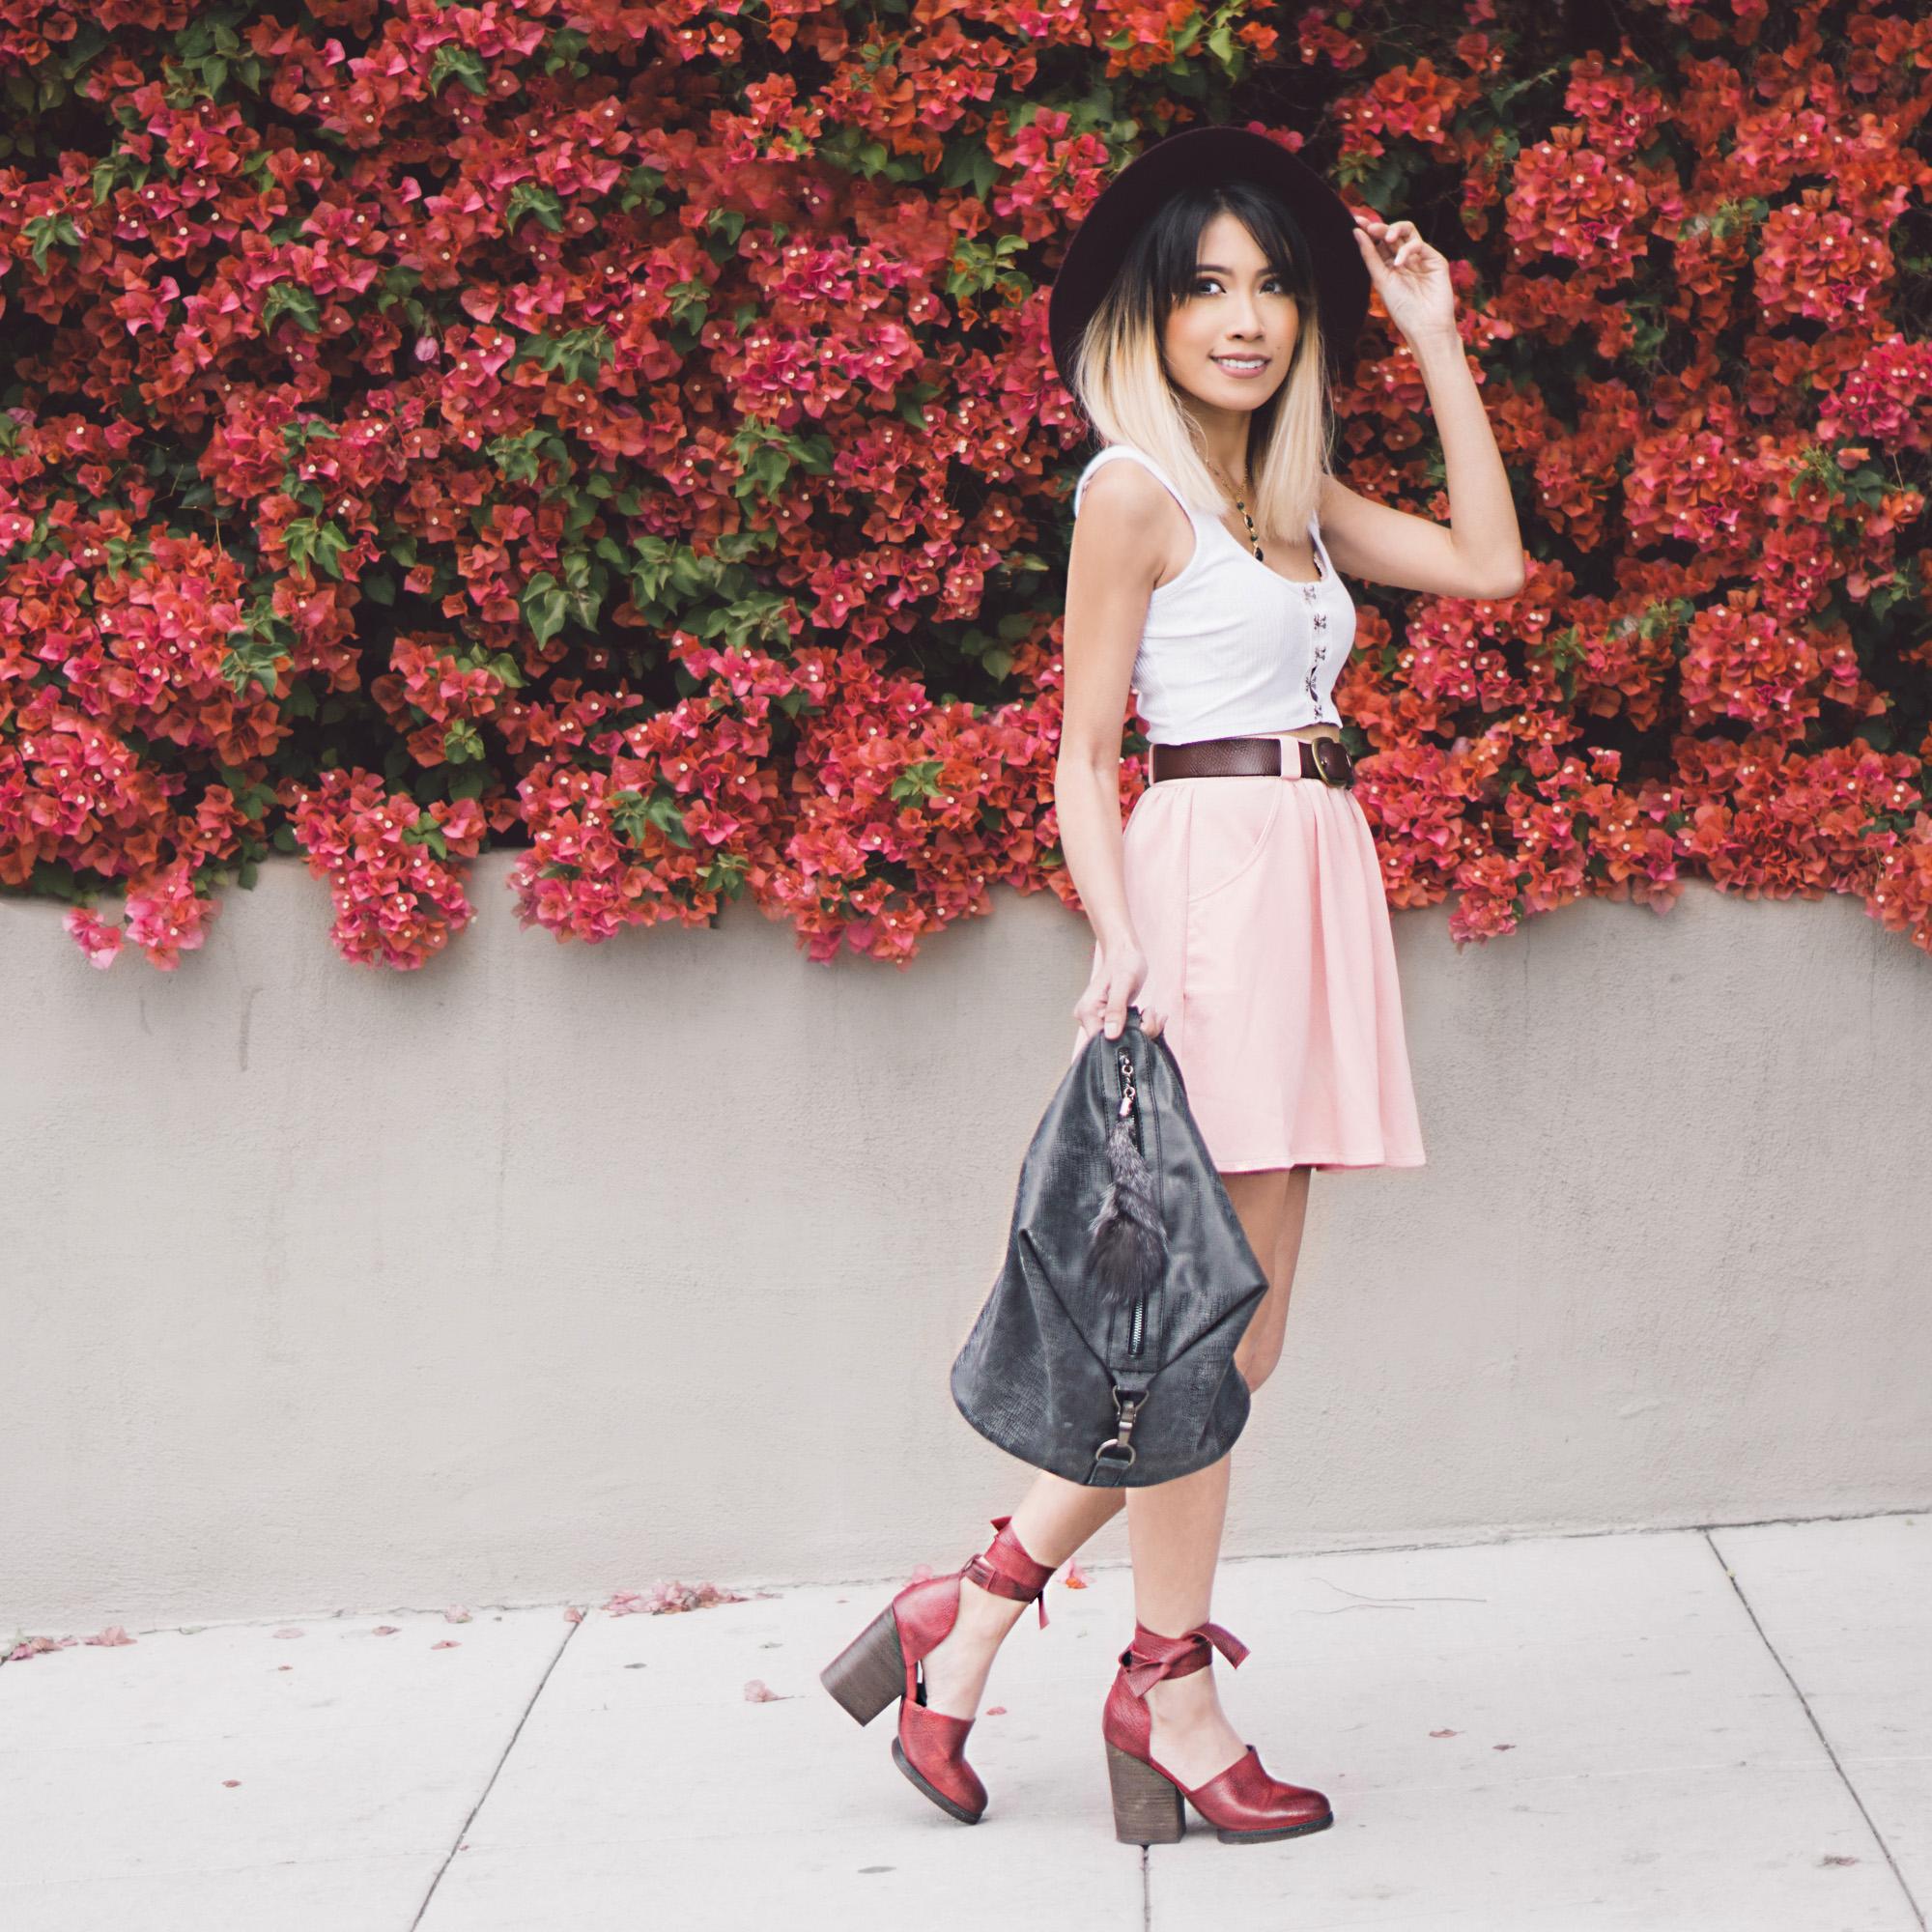 Hat :  Billabonog    Top :  Sunny Afternoon Cropped Tank Top    Skirt : (similar)  Myah Pleated Skater Skirt    Bag :  Cassi Draped Backpack Black    Shoes : (similar)  Cora Wrap Heel